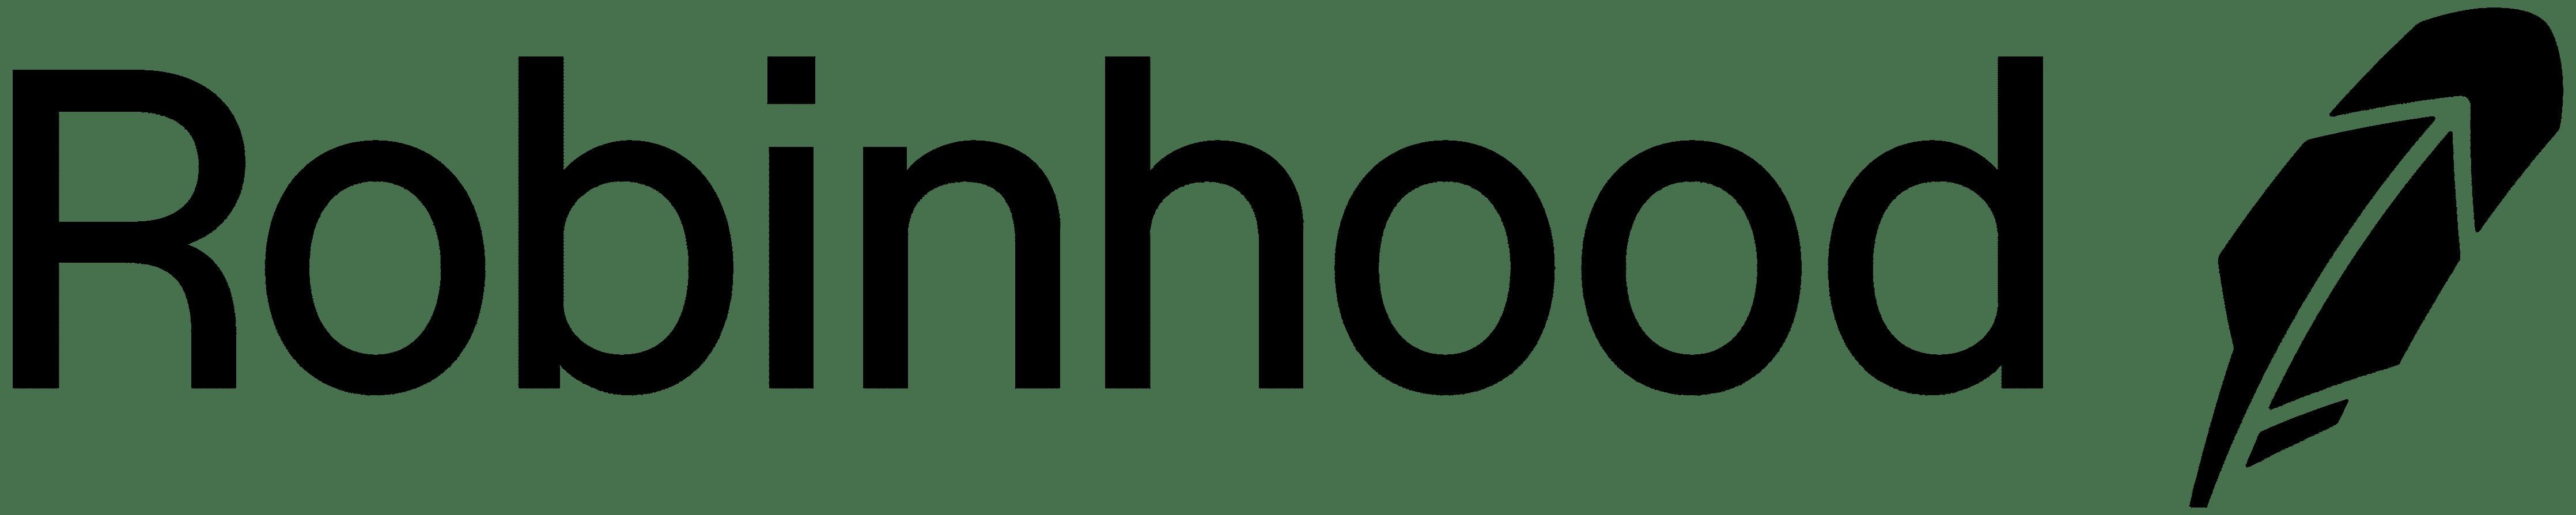 Logotipo de Robinhood